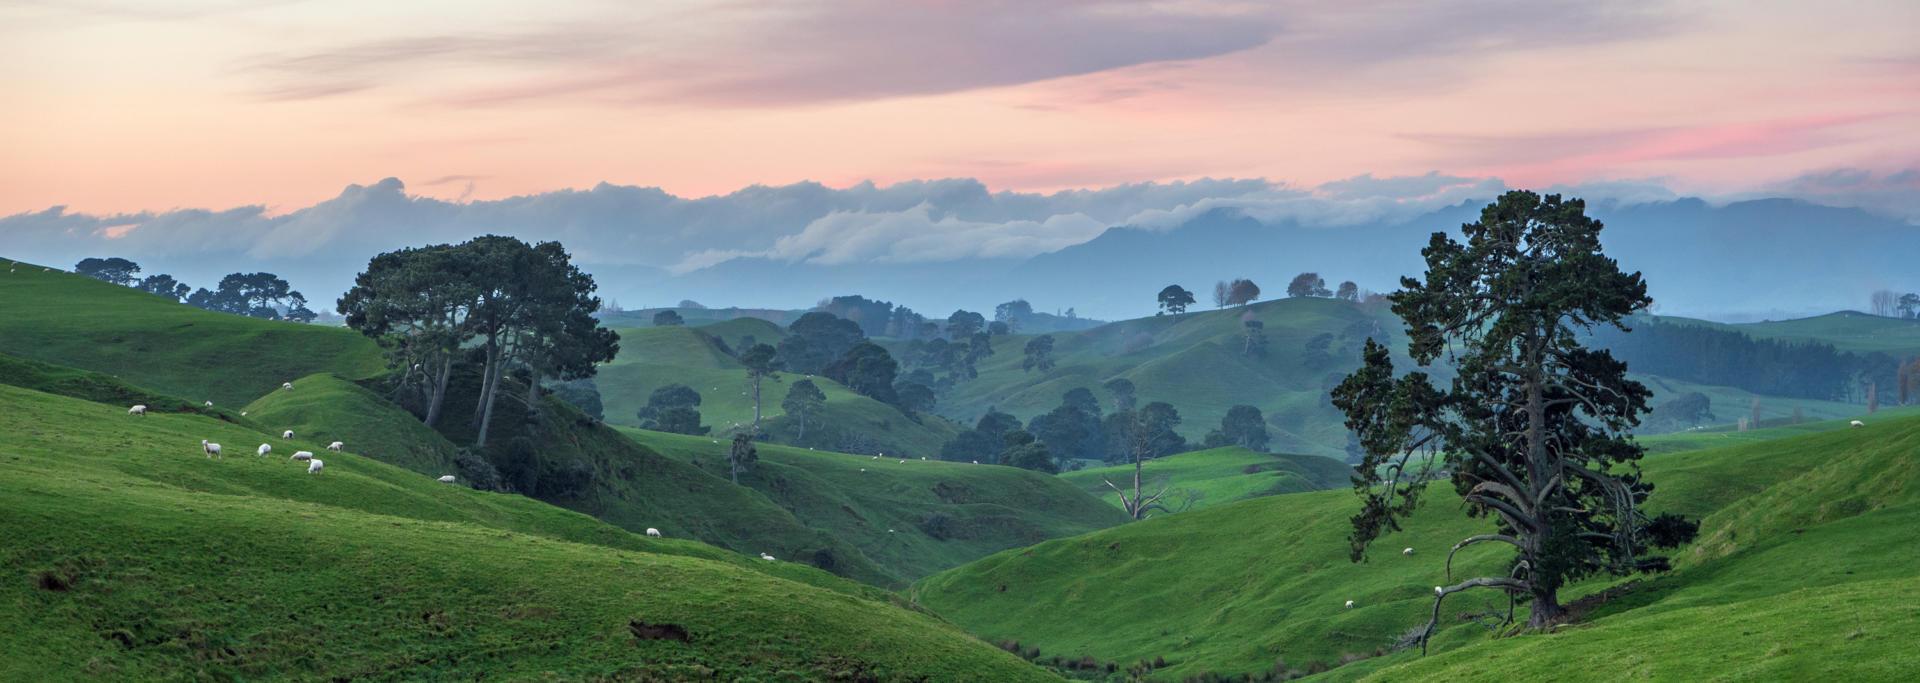 Waikato Rural 01 P